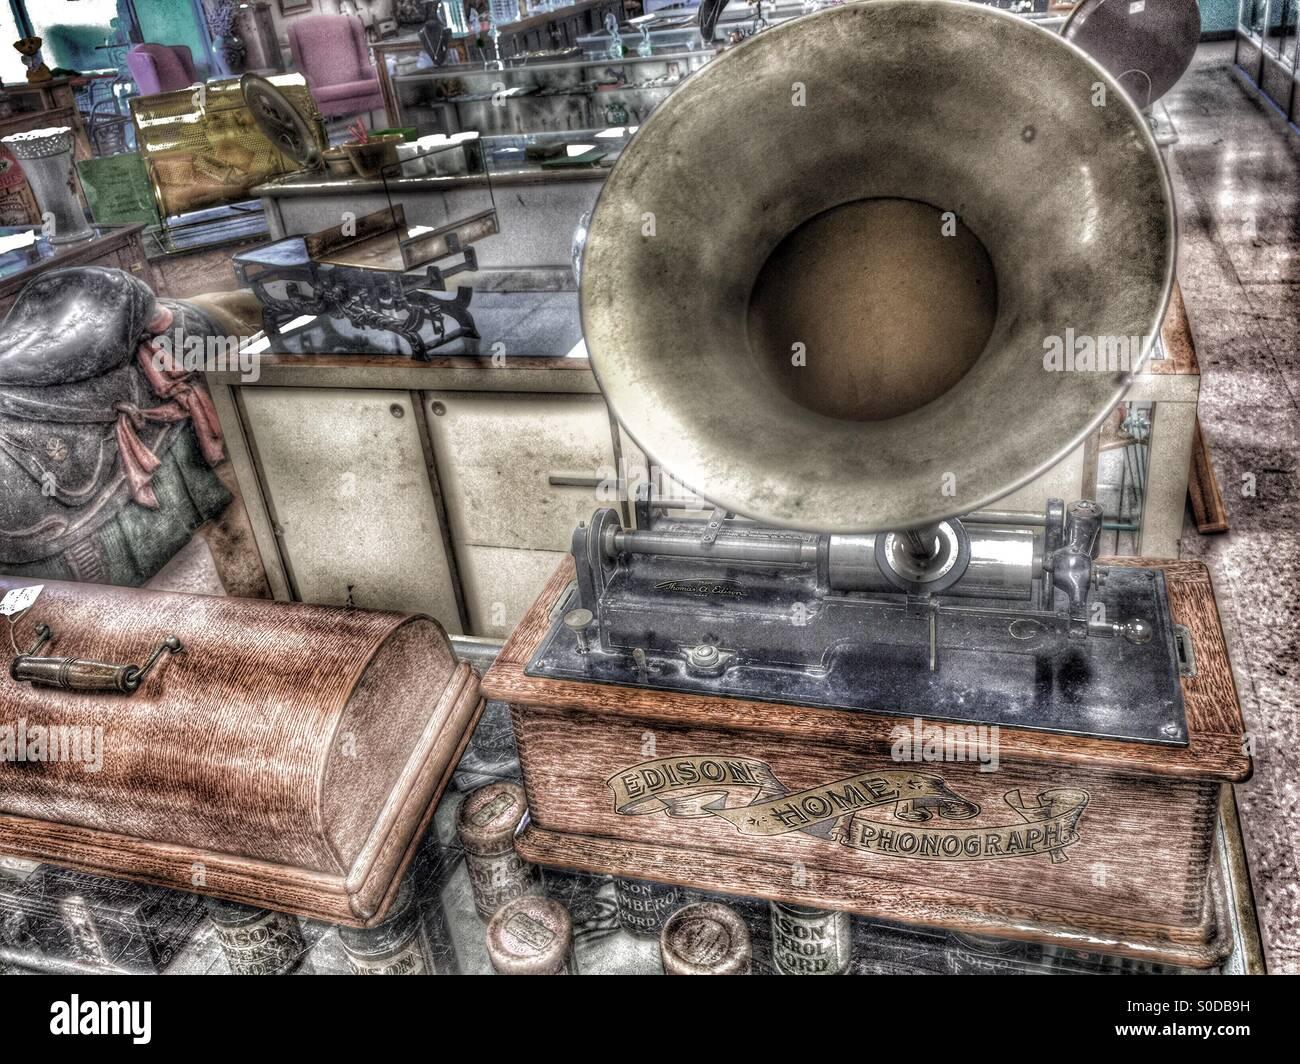 dating edison phonographs